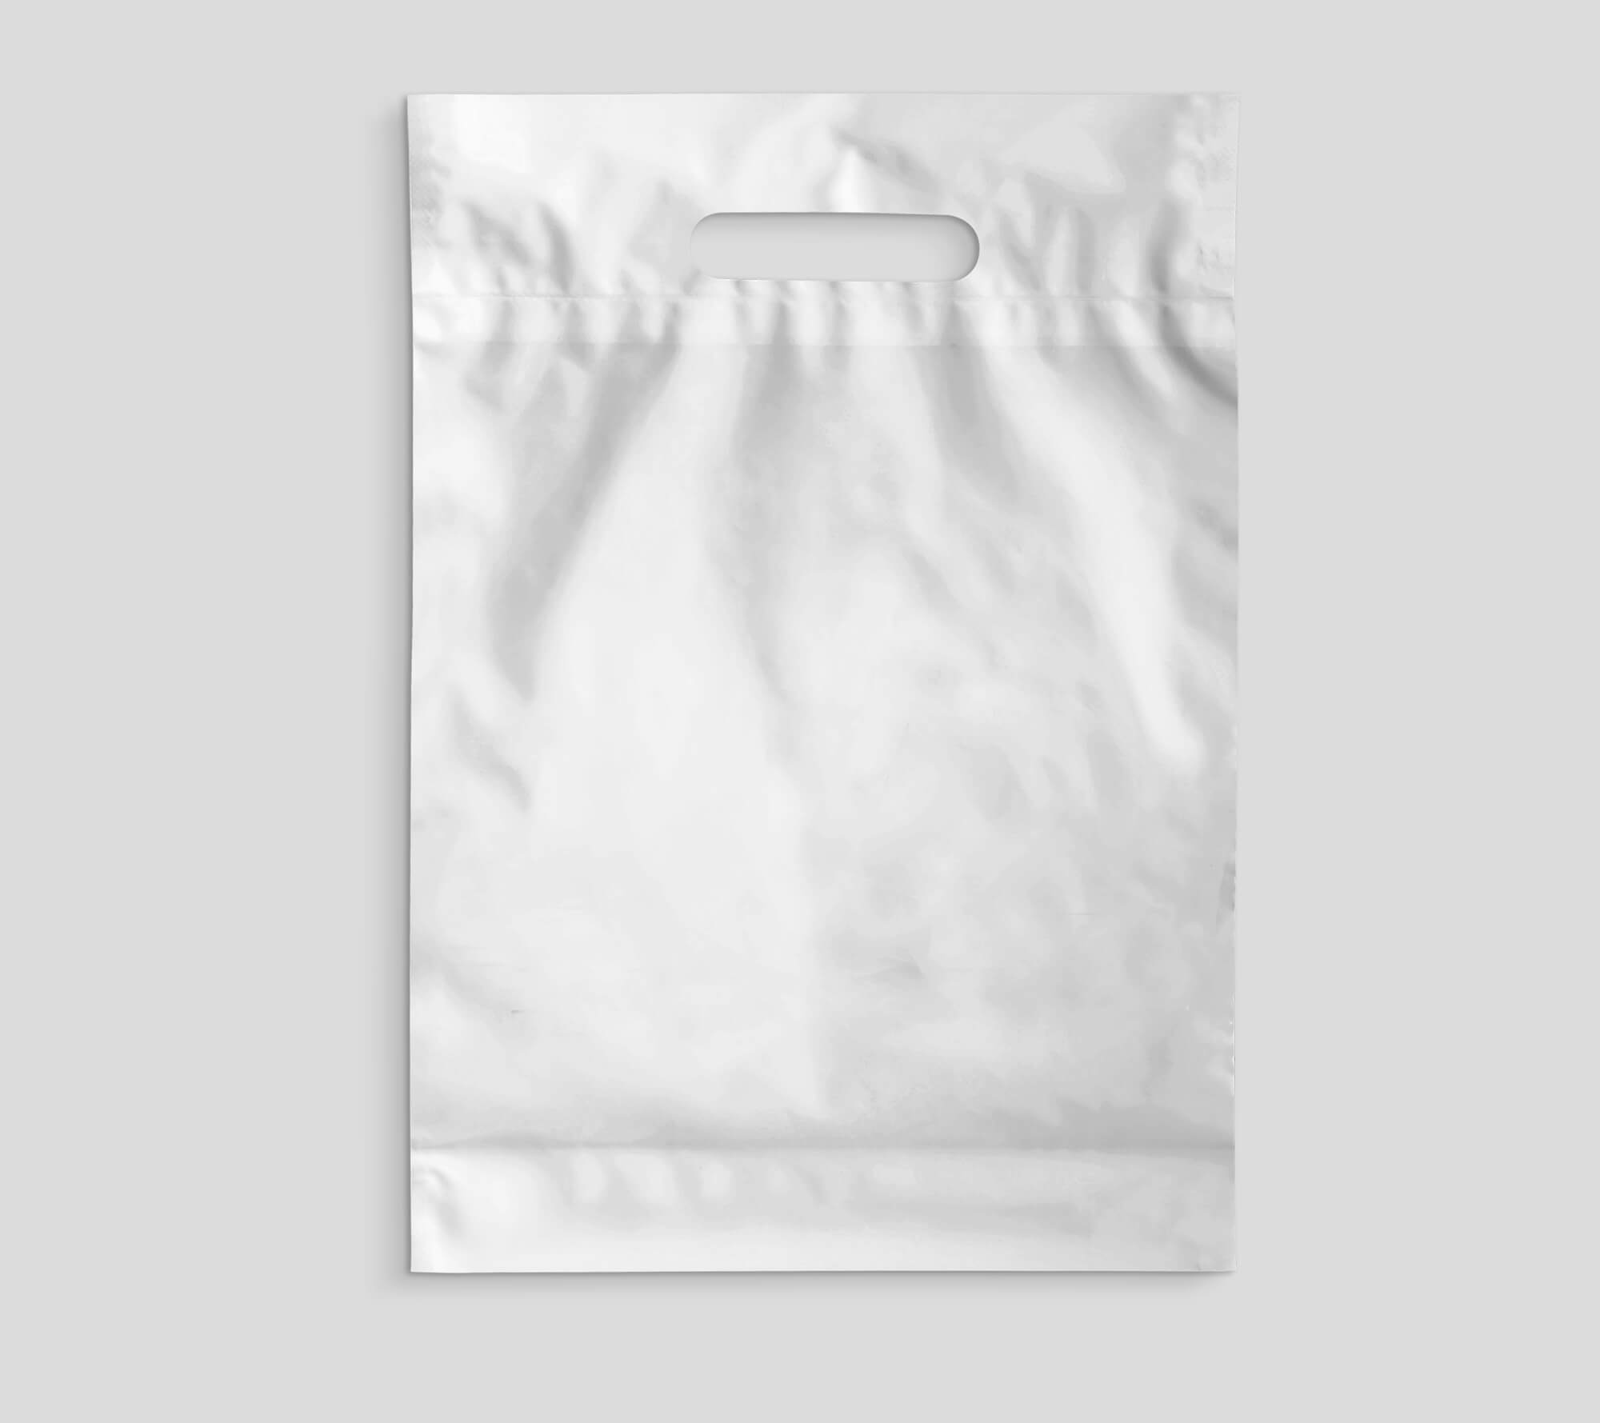 Free close up on coffee mug mockup. 20 Innovative Plastic Bag Mockup Psd Templates Mockup Den